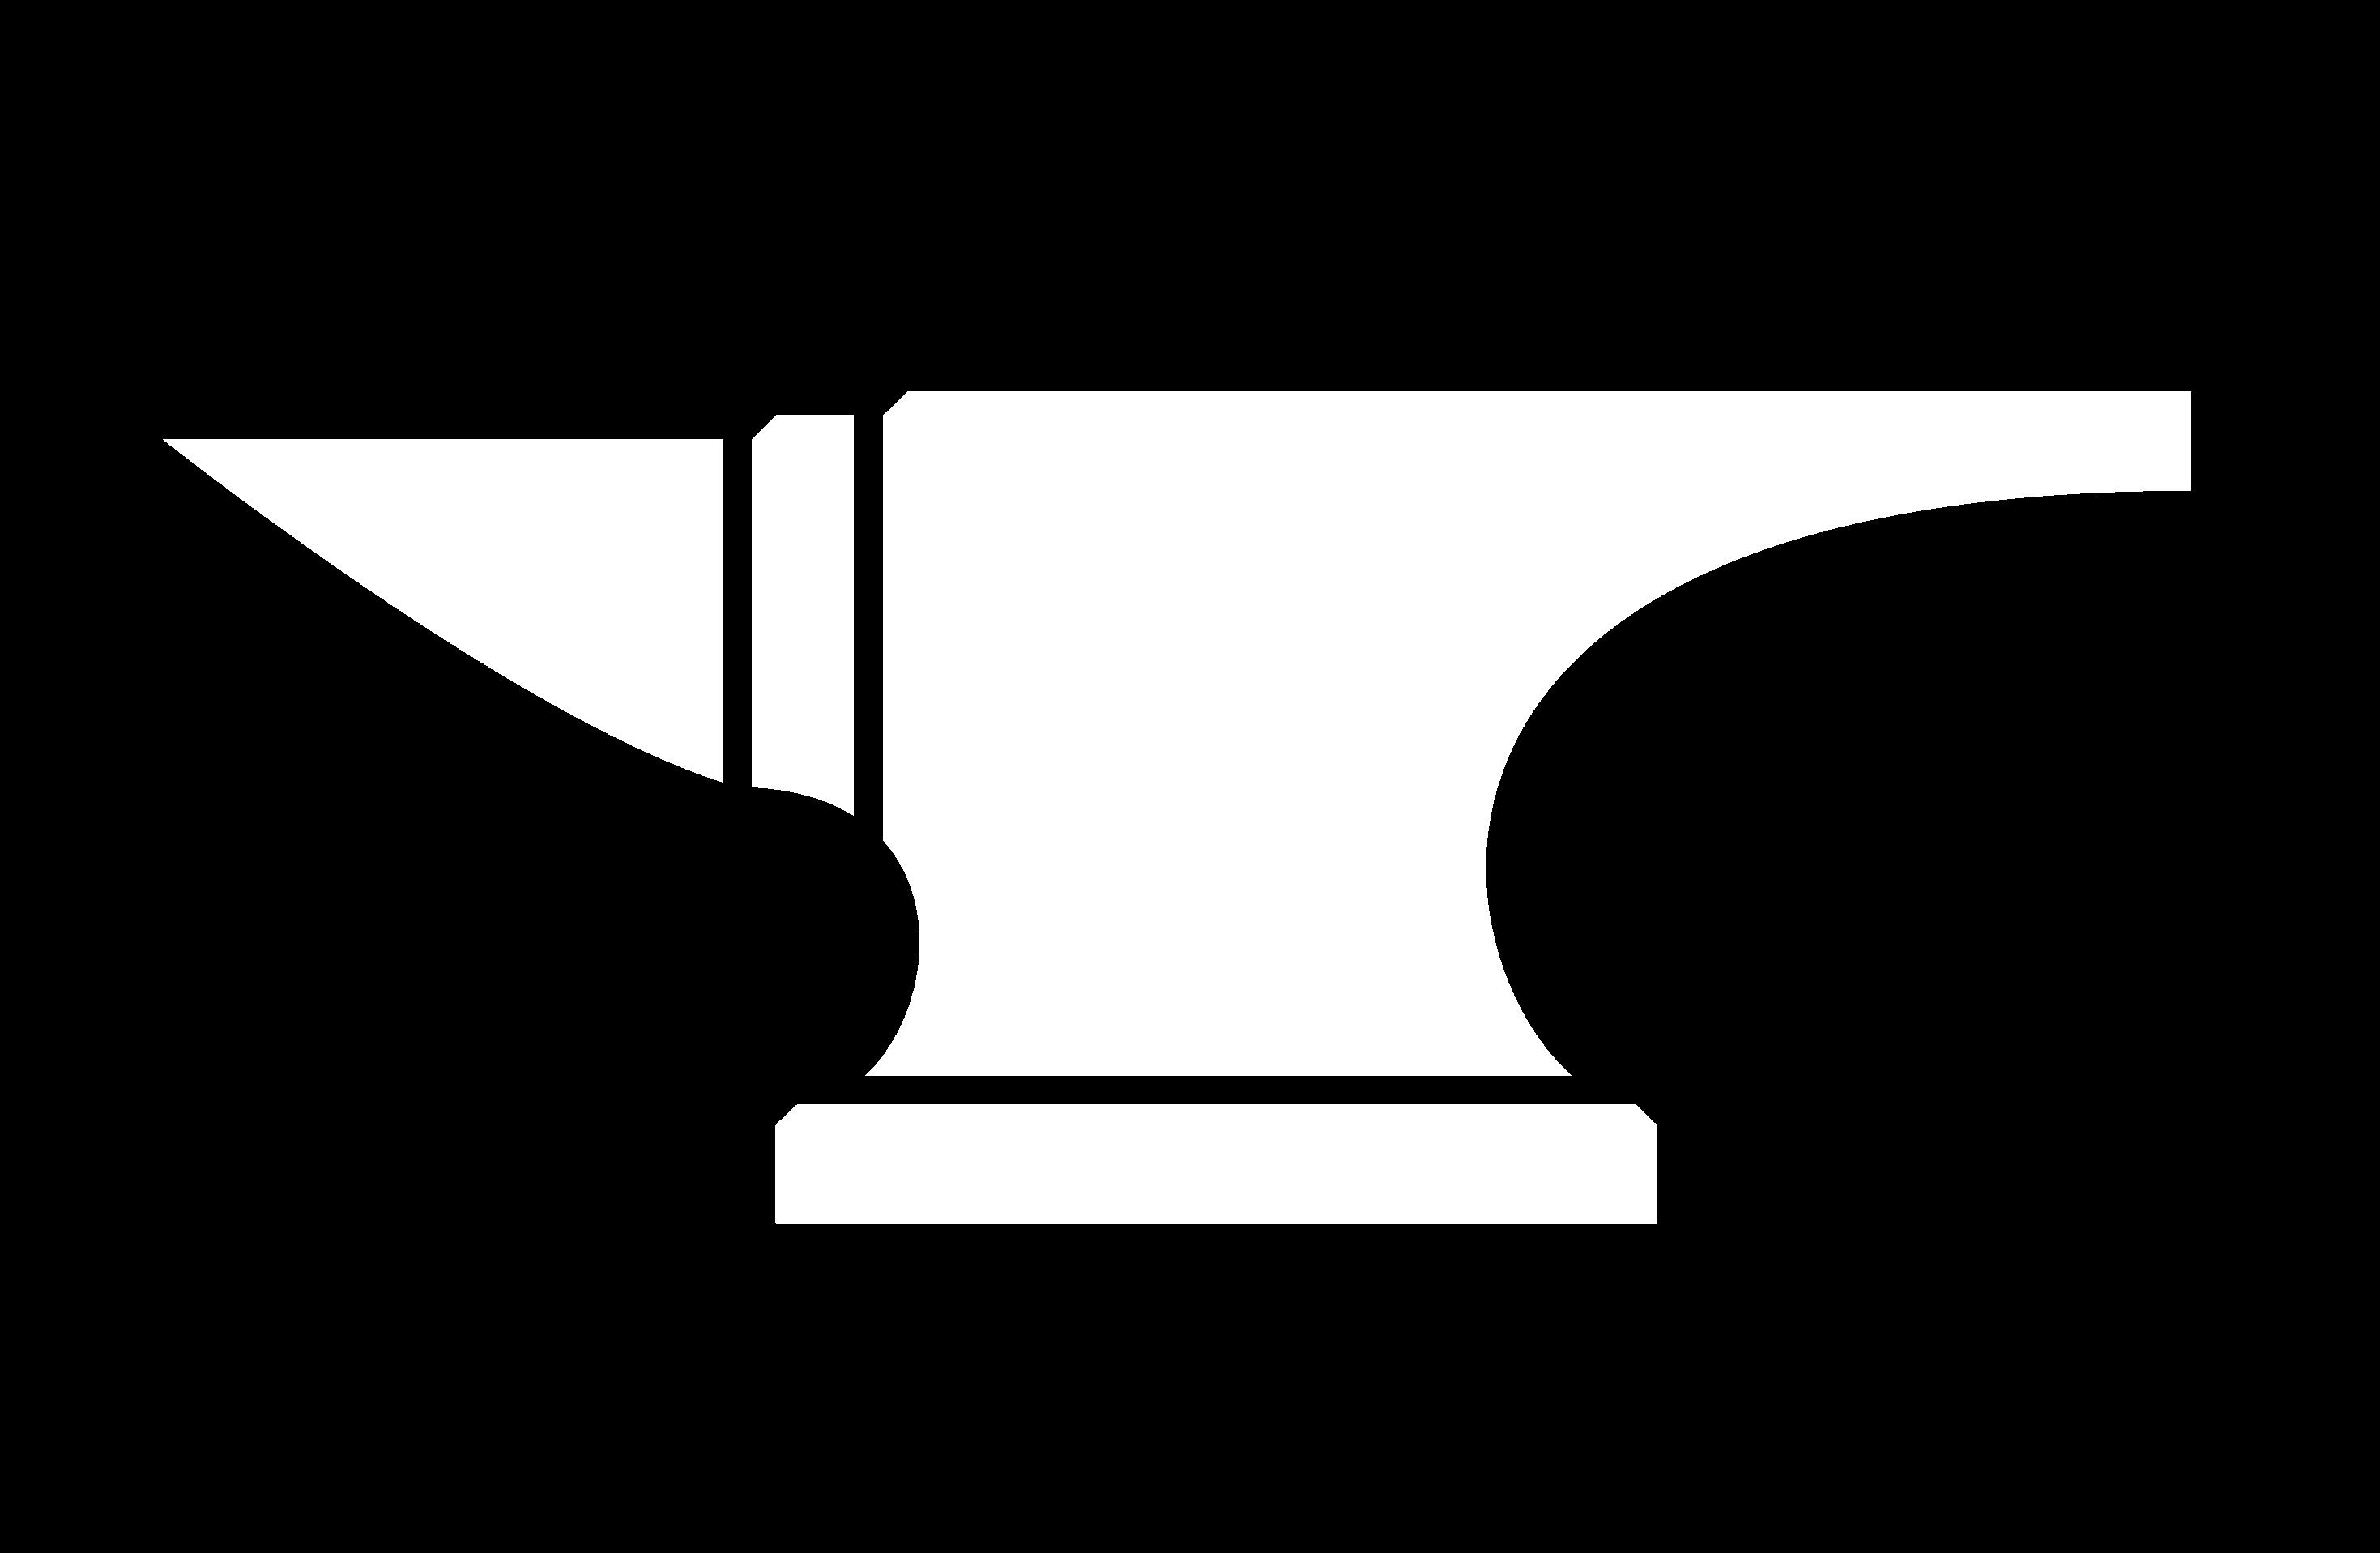 ambolt logo